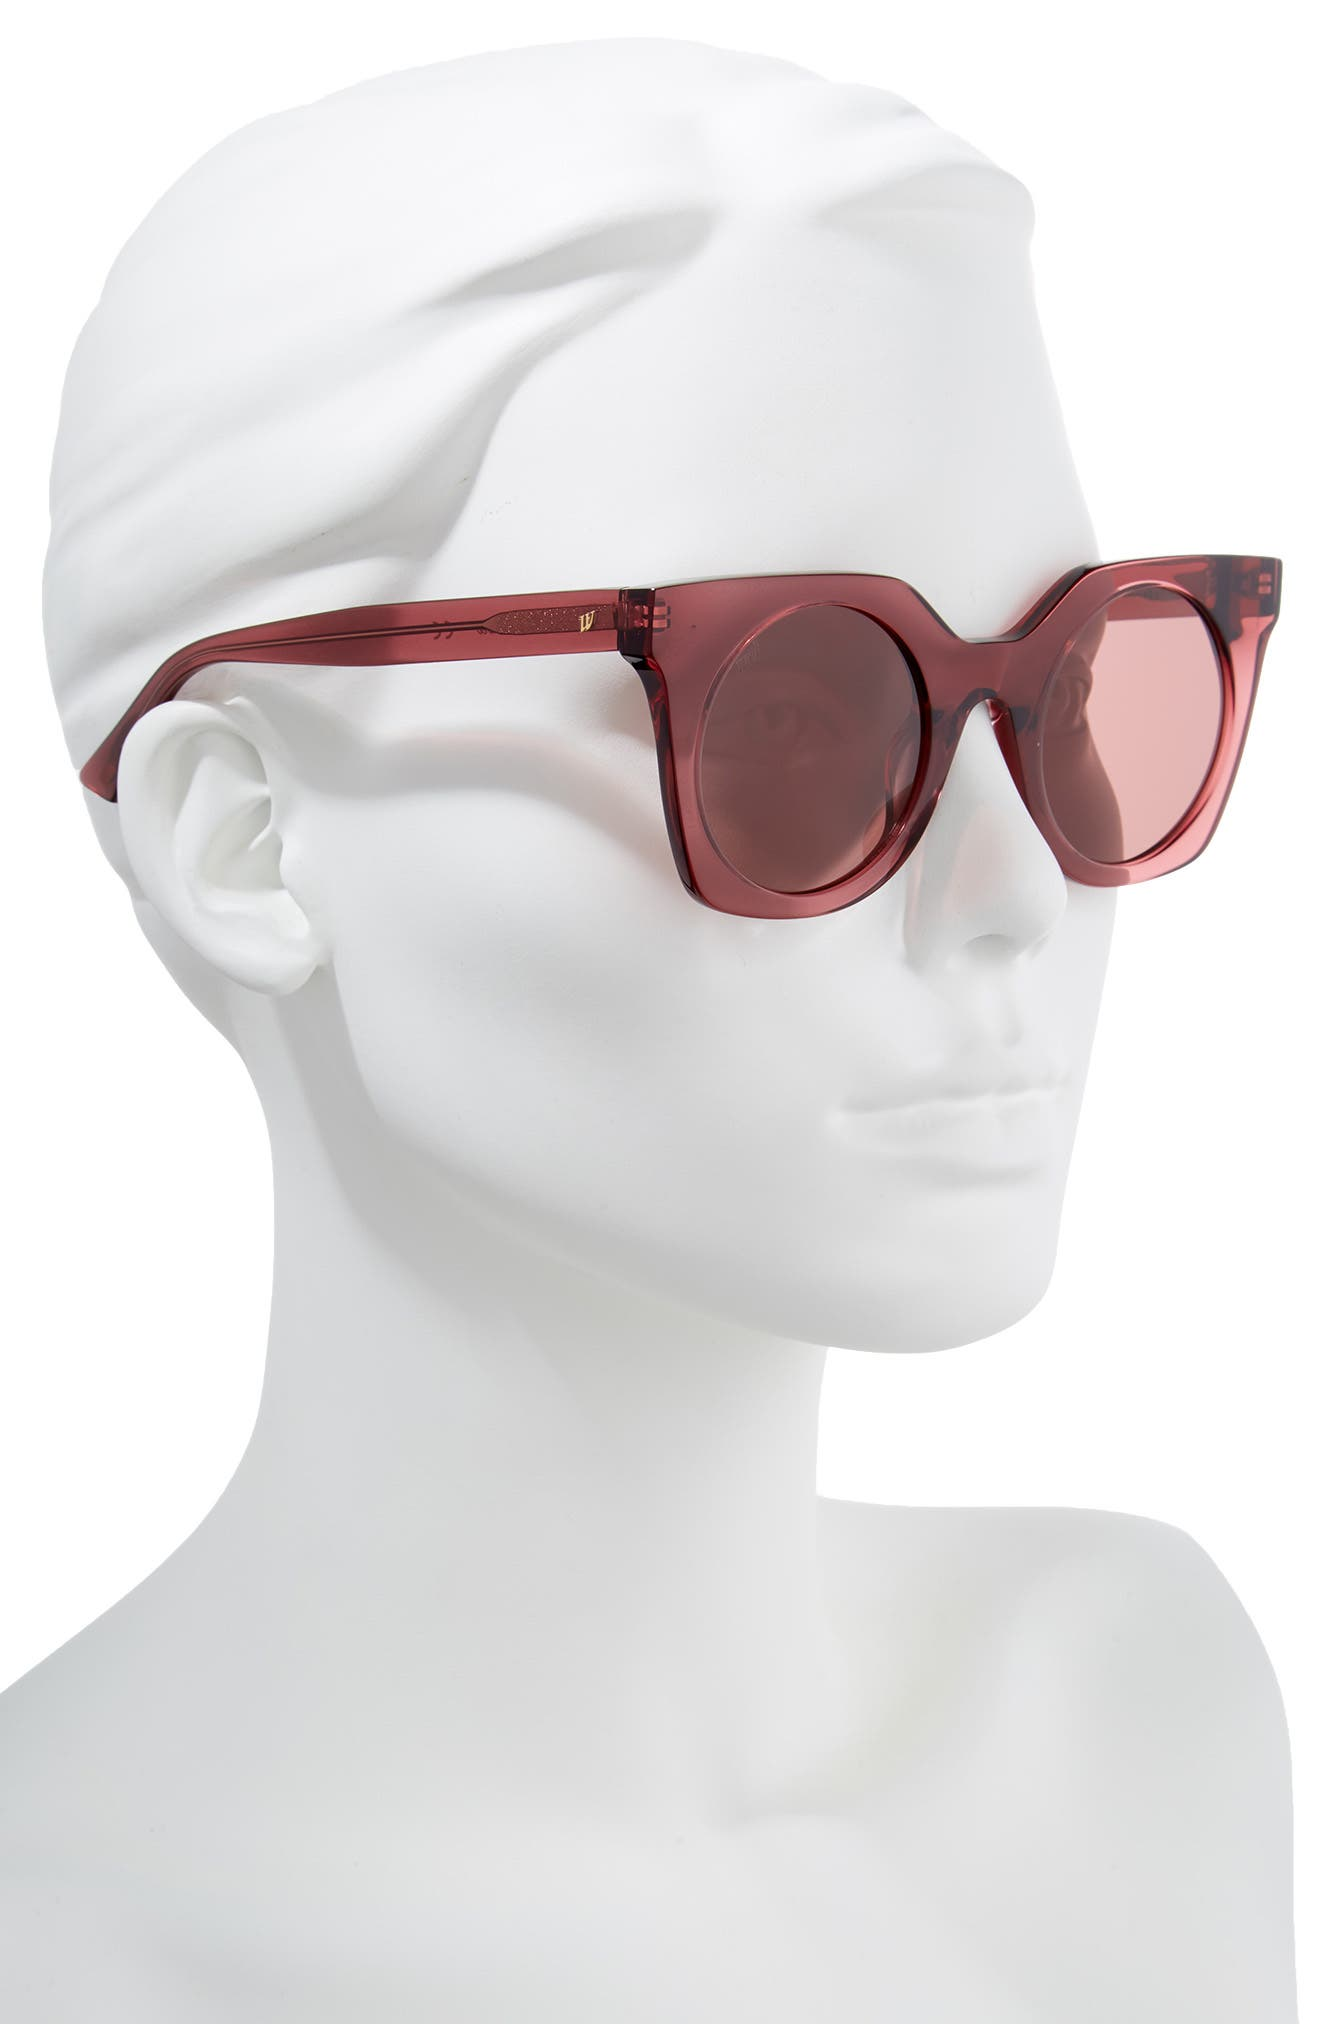 48mm Sunglasses,                             Alternate thumbnail 2, color,                             Shiny Violet/ Violet